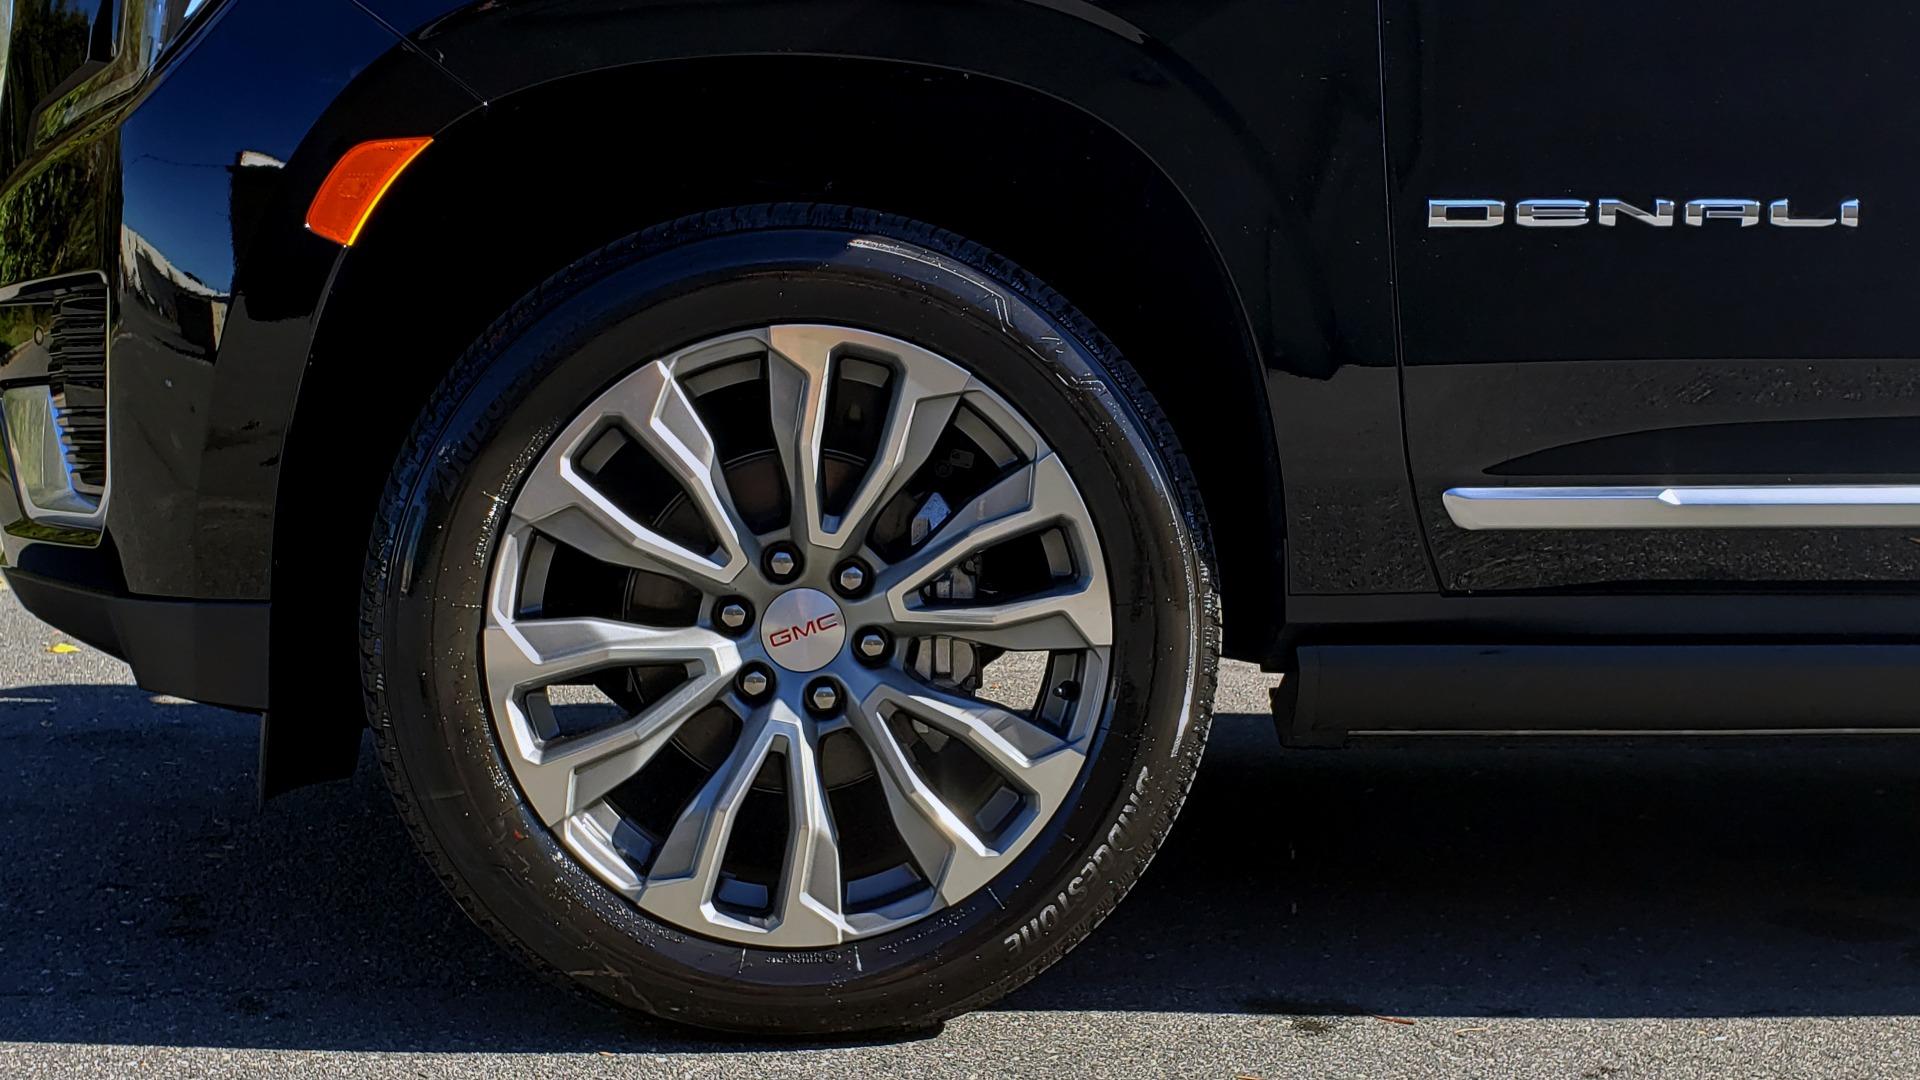 Used 2021 GMC YUKON DENALI PREMIUM 4WD / NAV / ADVANCED TECH / ENTERTAINMENT for sale Sold at Formula Imports in Charlotte NC 28227 112